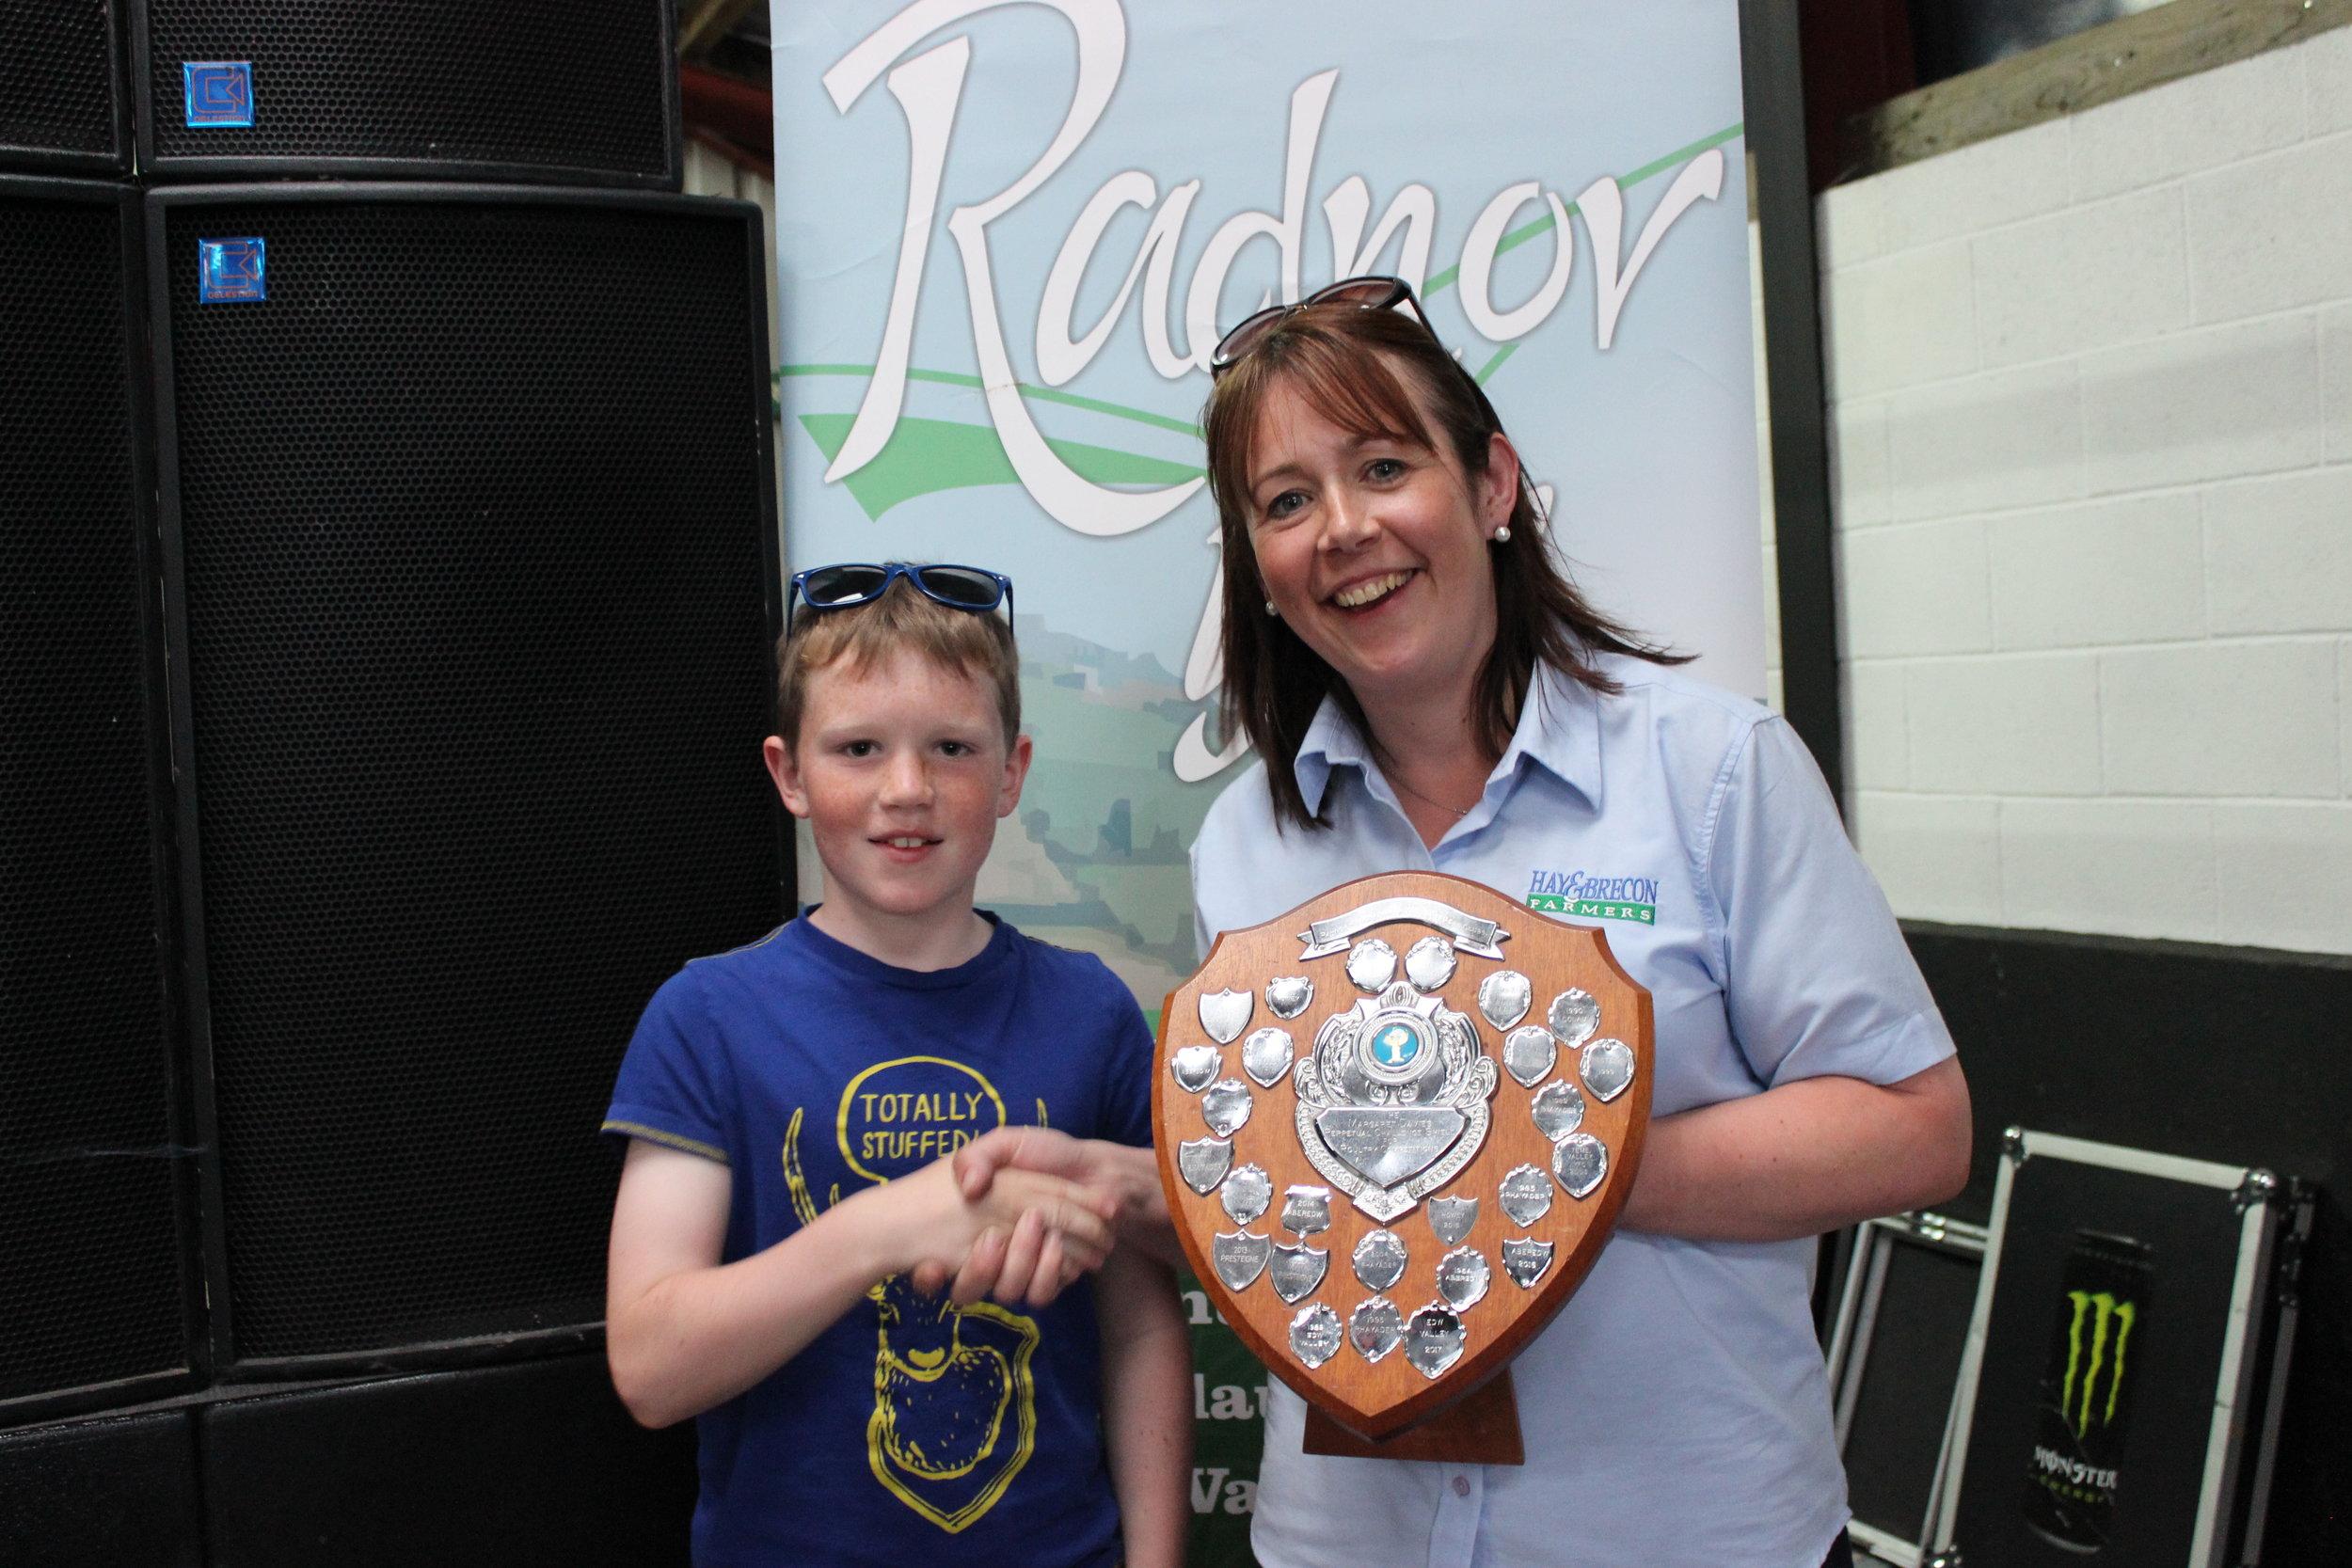 Harri Bird, Rhosgoch YFC - Mrs Margaret Davies Shield / Dressing Up & Generation Game Competitions